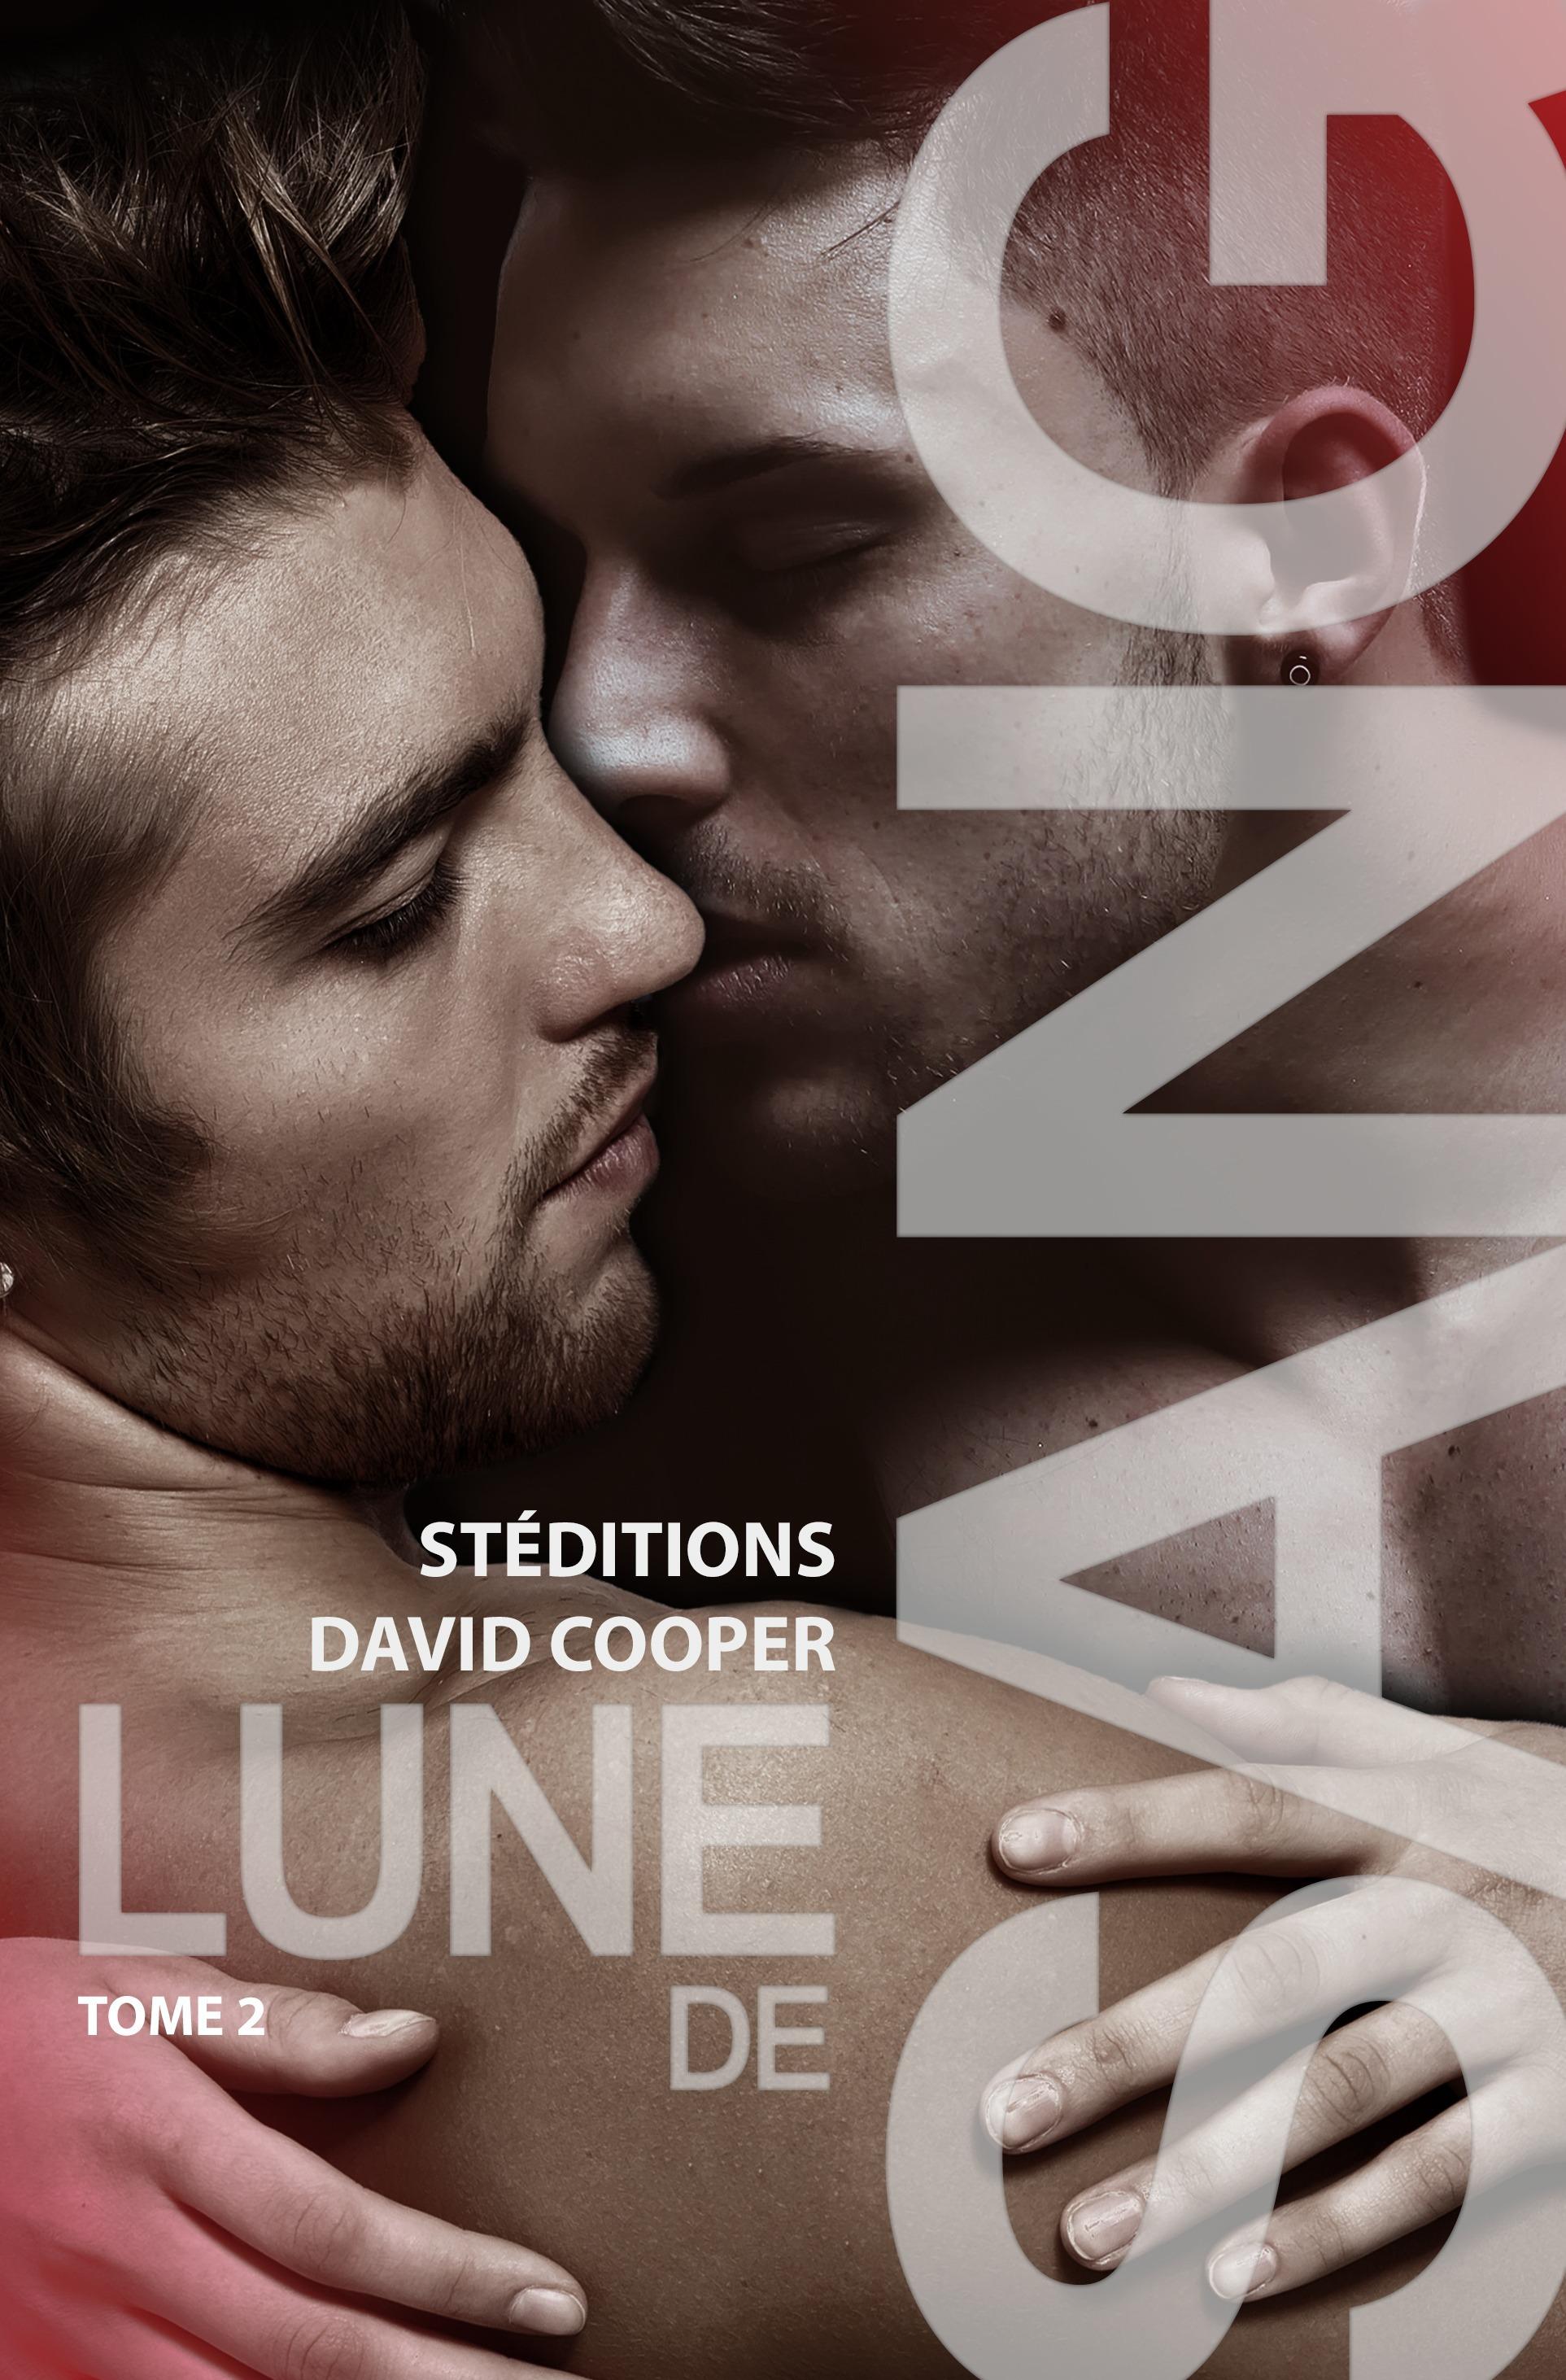 Lune de sang - Tome 2   Roman gay, livre gay